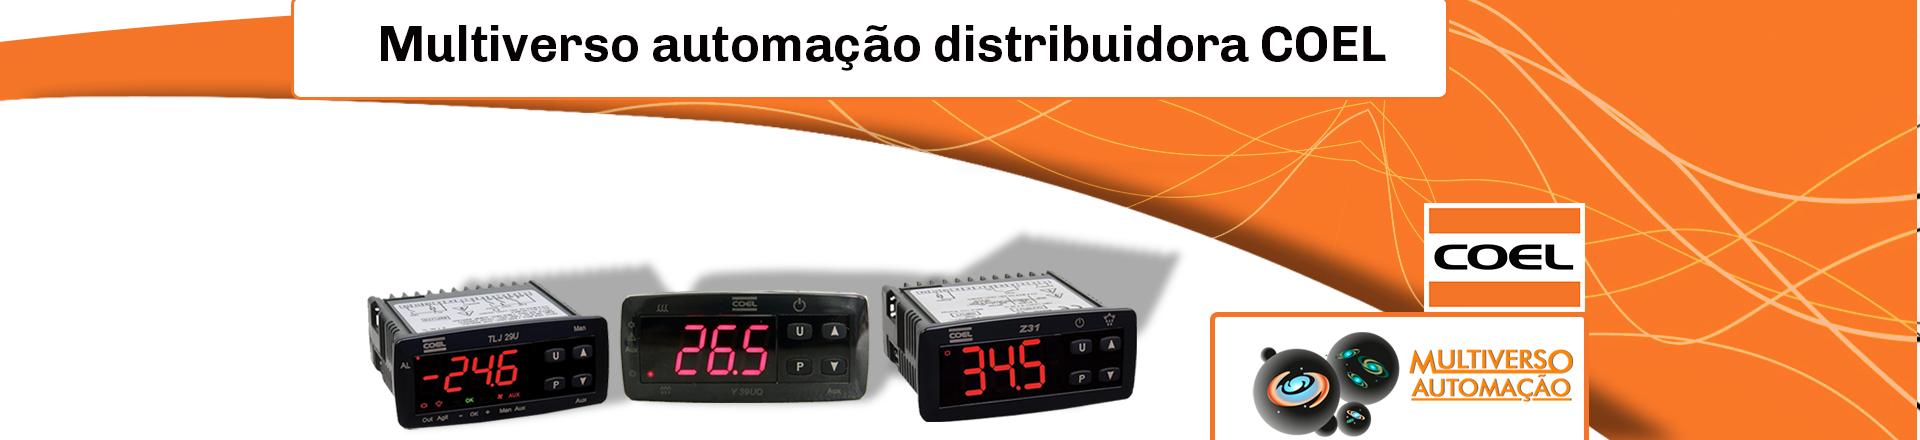 Distribuidora COEL